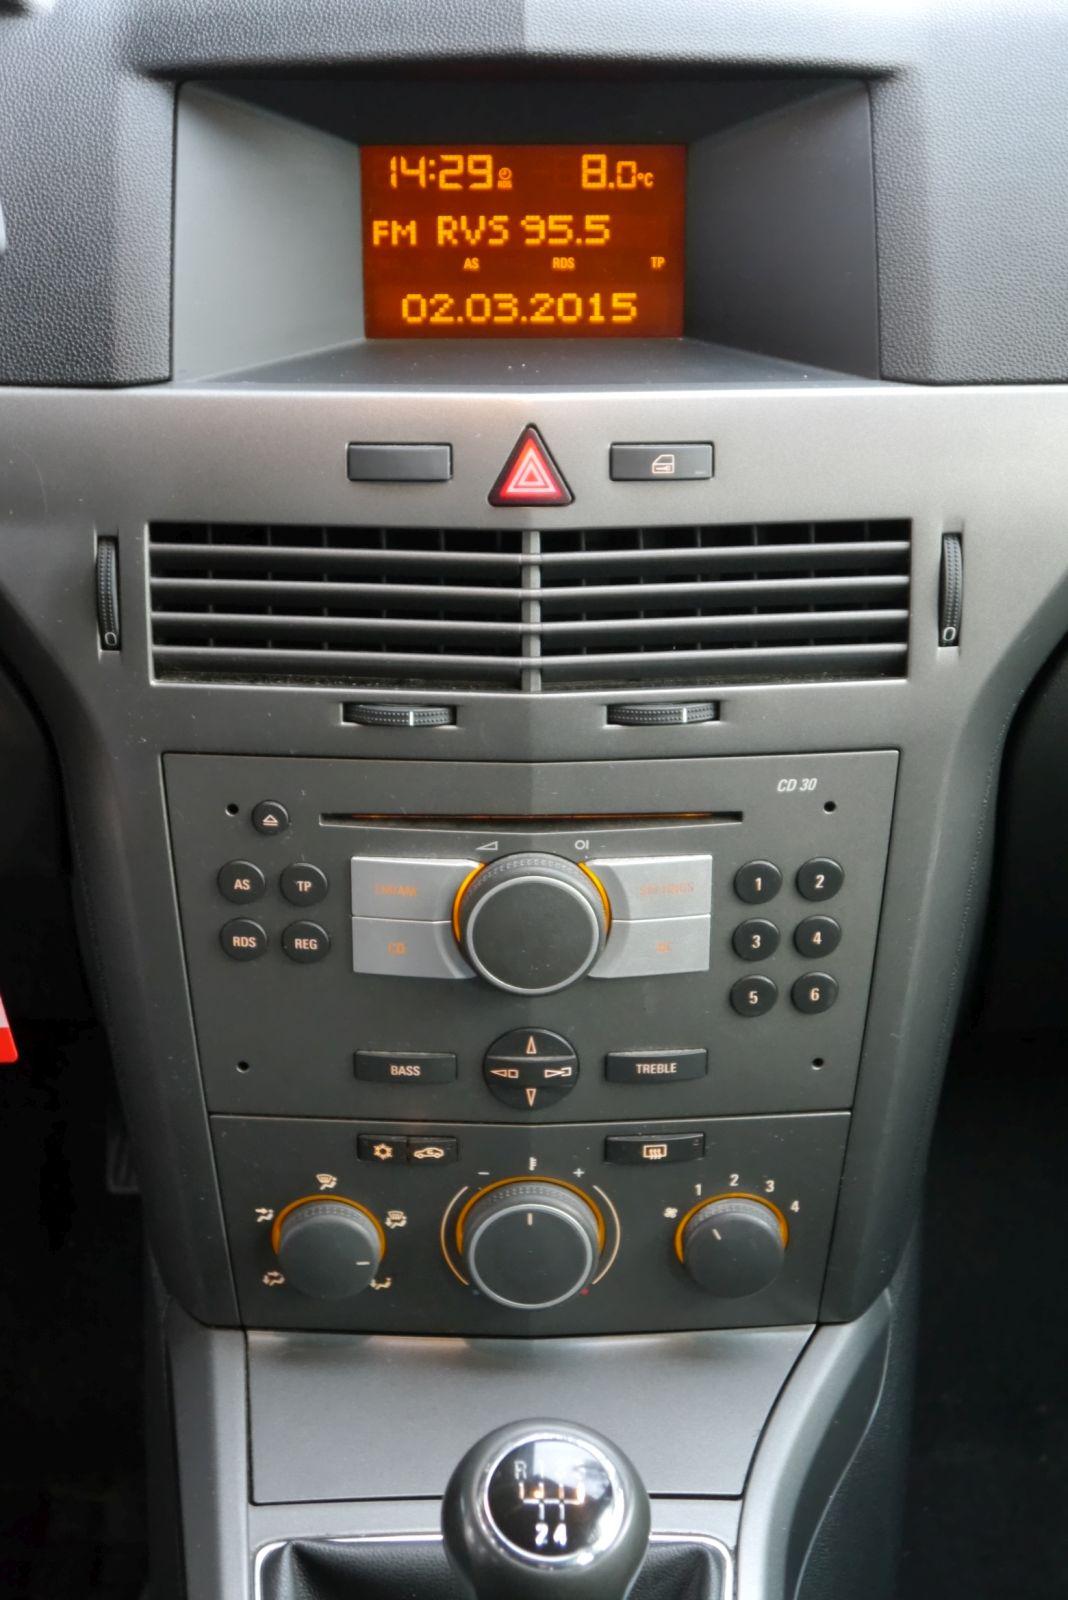 Opel Astra H 1.6i Basis 2005 Euro 4 – EURO FIX » Vanzari auto second ...